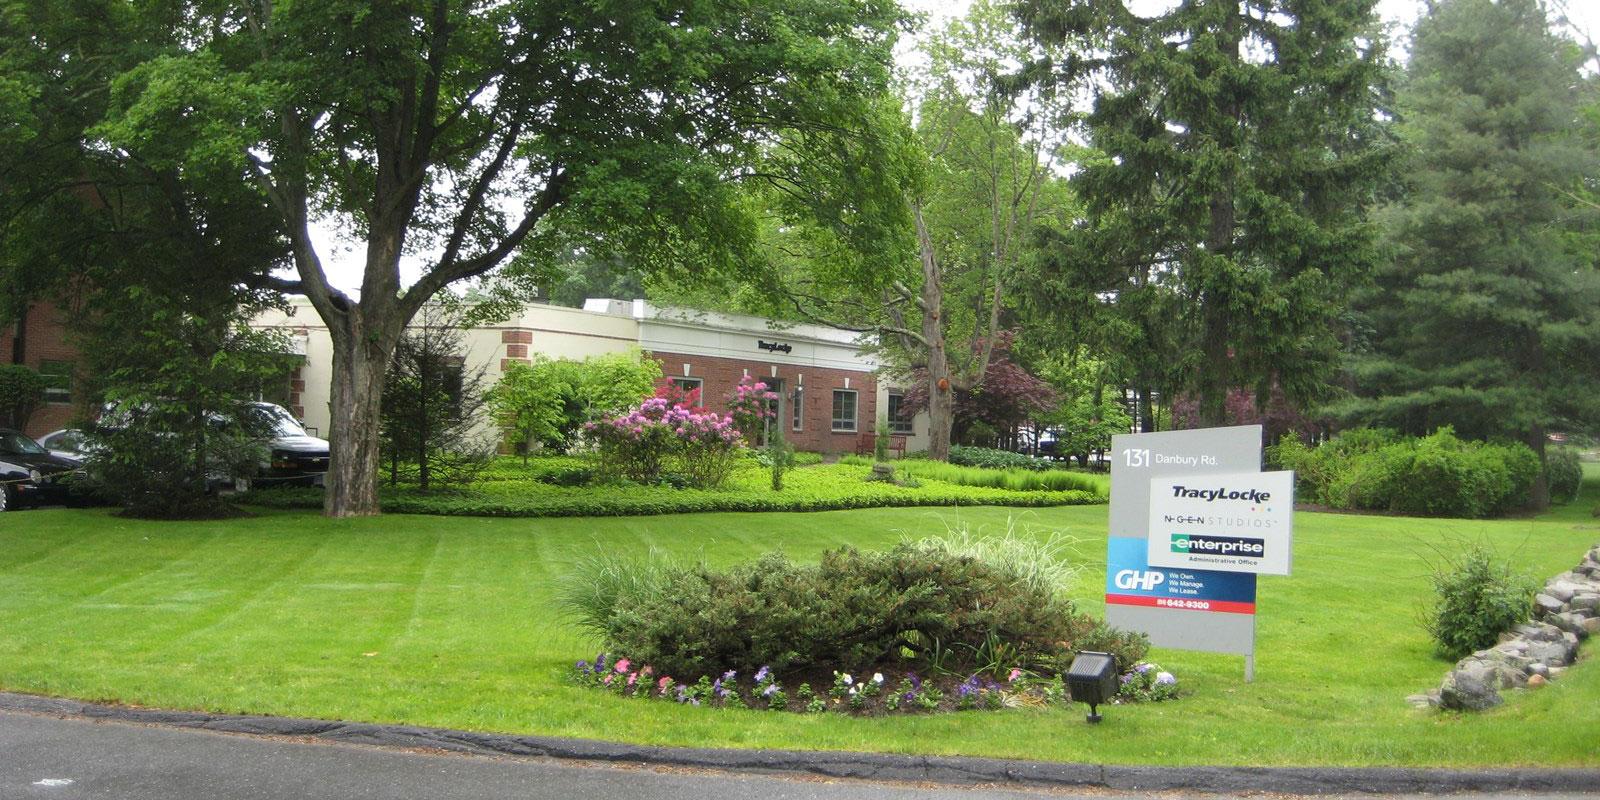 131 Danbury Road – Wilton, CT 06897 – 2,339 sq. ft.